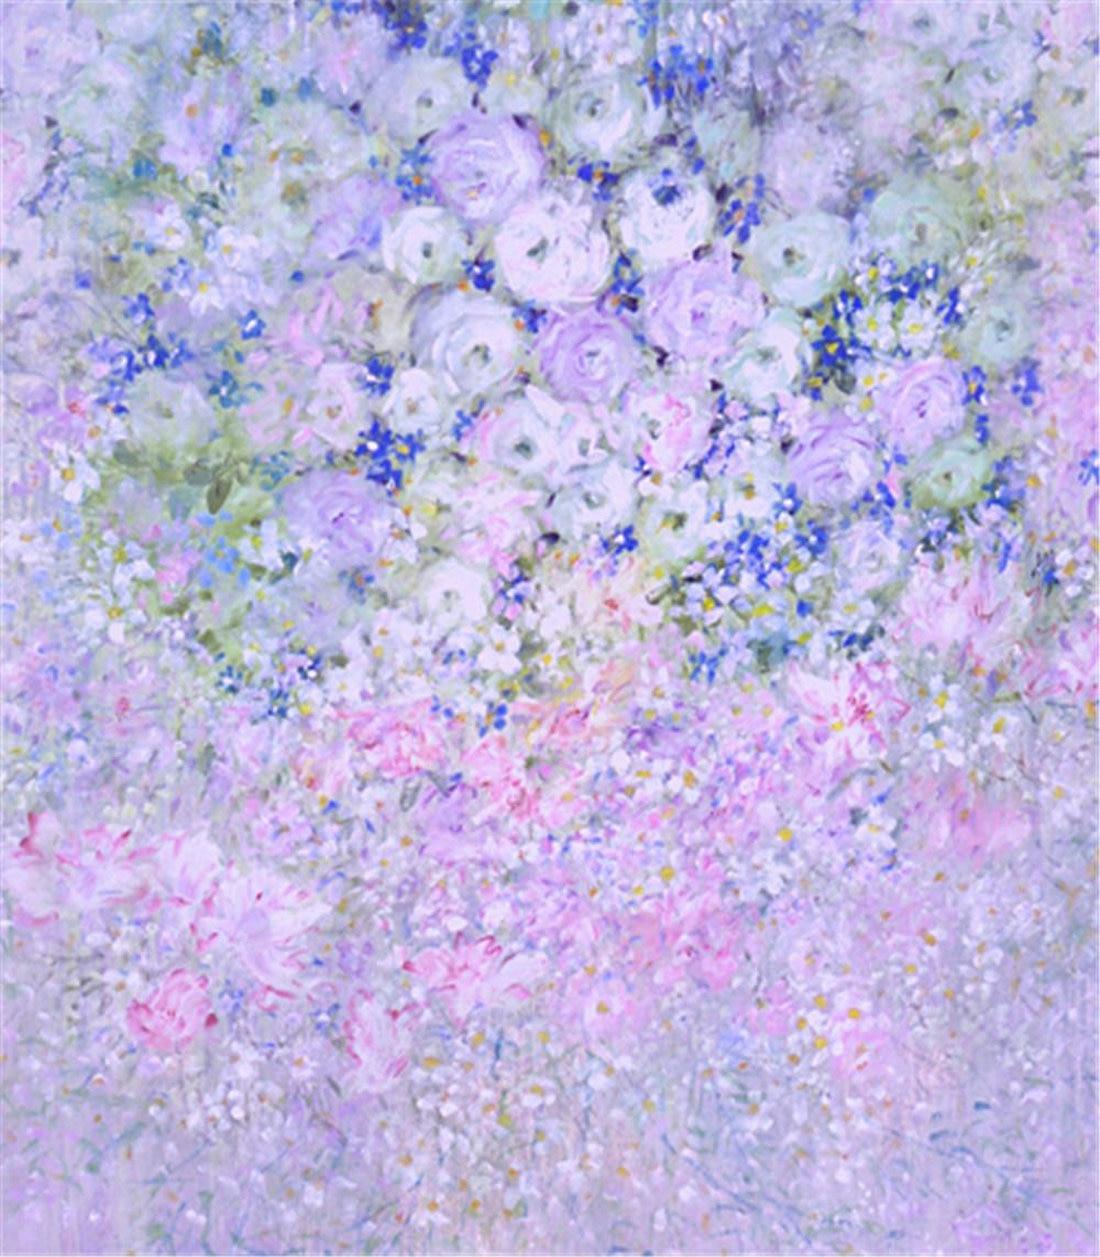 Bokeh Flowers Wedding: Hot Bokeh Colour Purple Flower Background Vinyl Cloth High